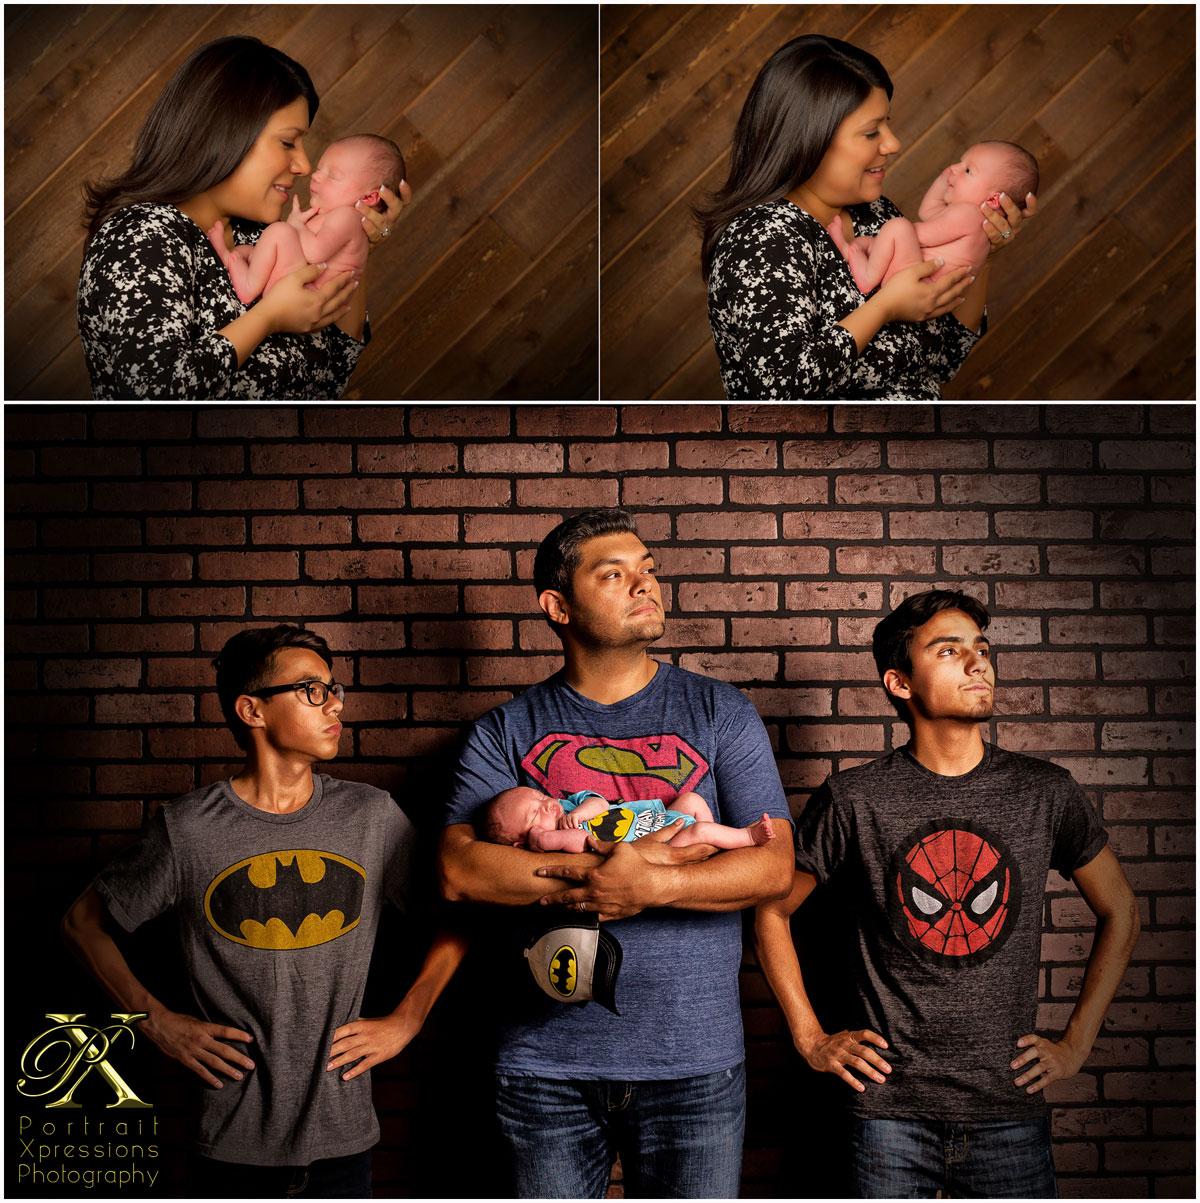 Dad with three boys wearing superhero shirts